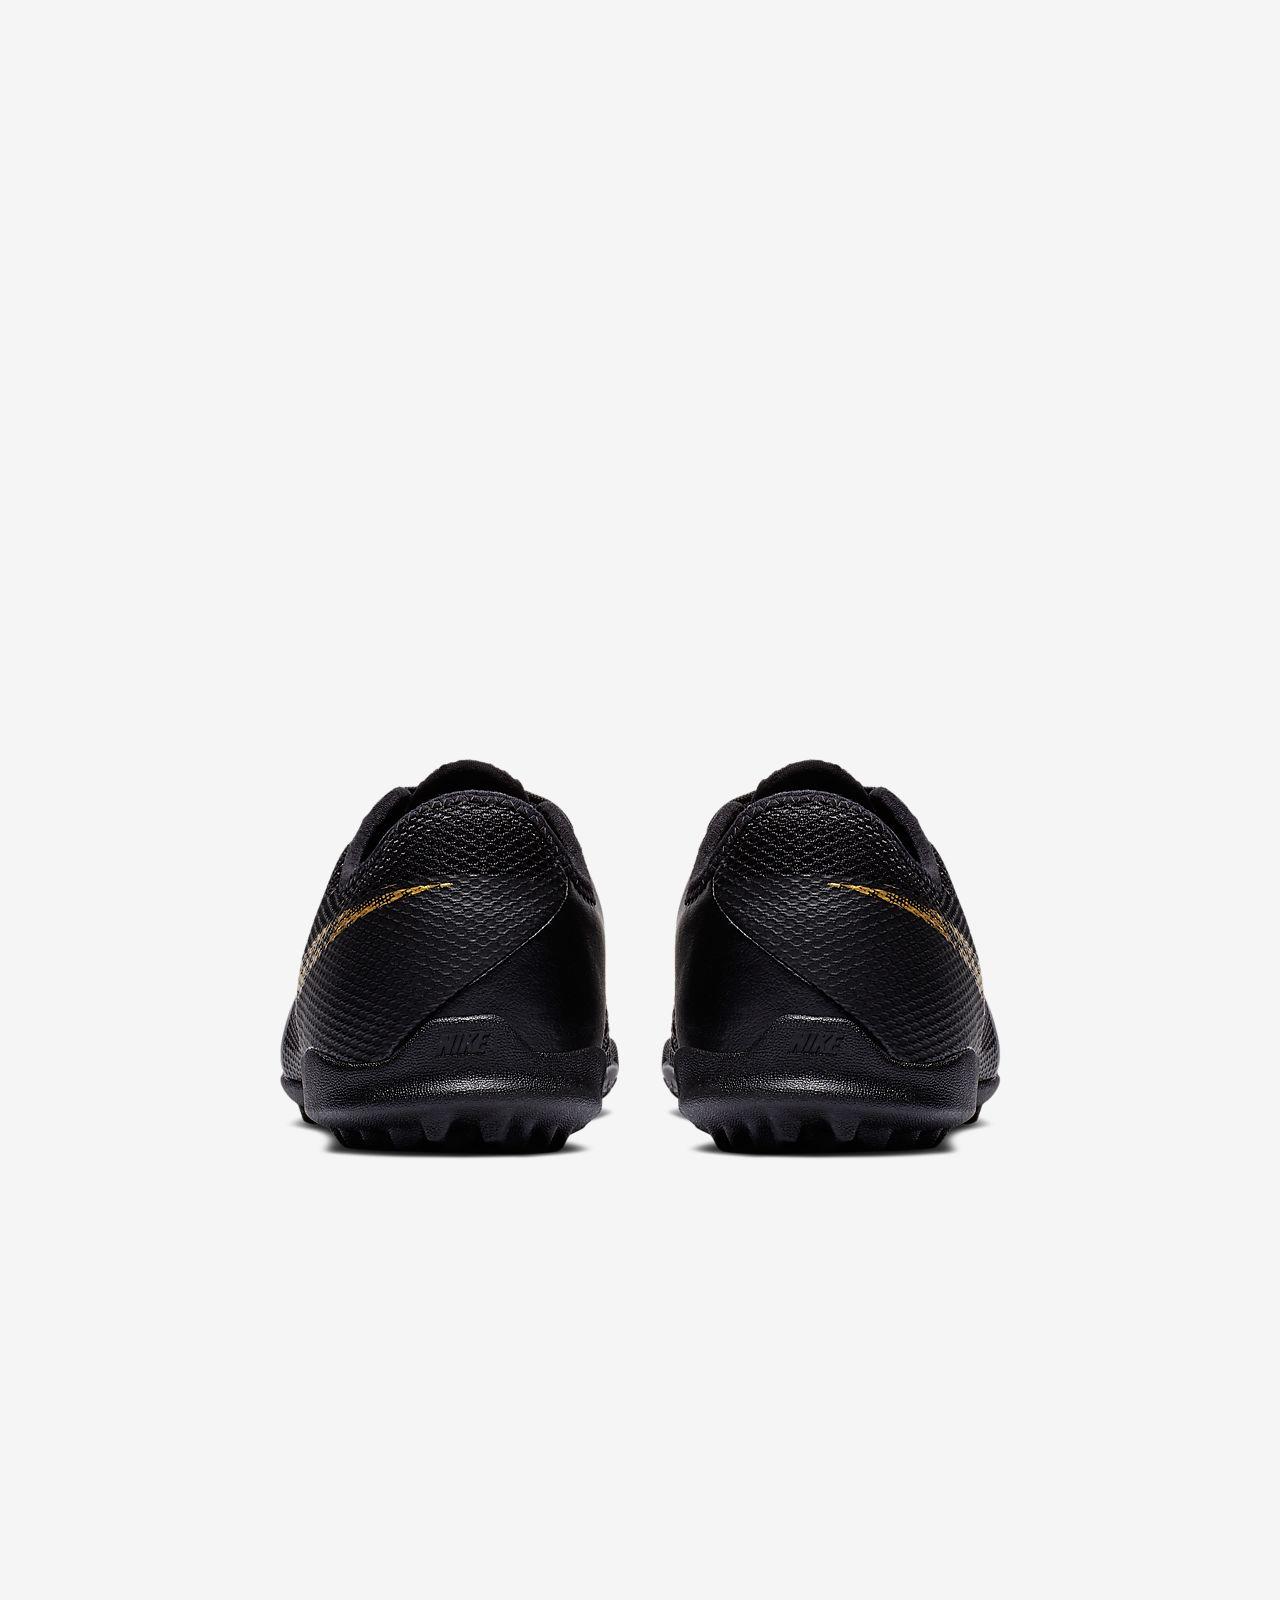 efd44ae9dac Nike Jr. Phantom Vision Academy TF Little Big Kids  Turf Soccer Shoe ...